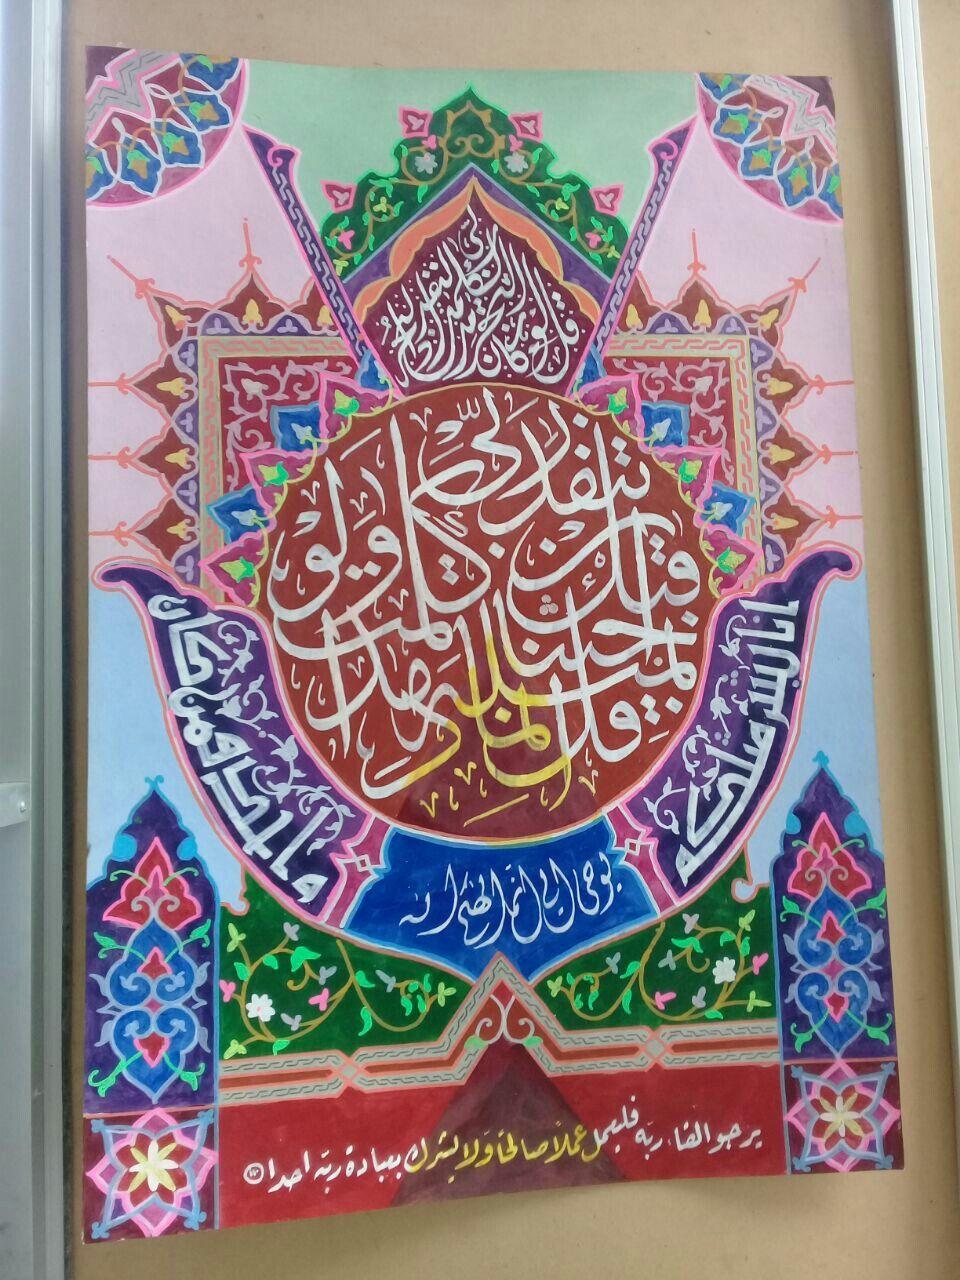 Pin Oleh Mochamad Navik Di Kaligrafi Dekorasi Kaligrafi Islam